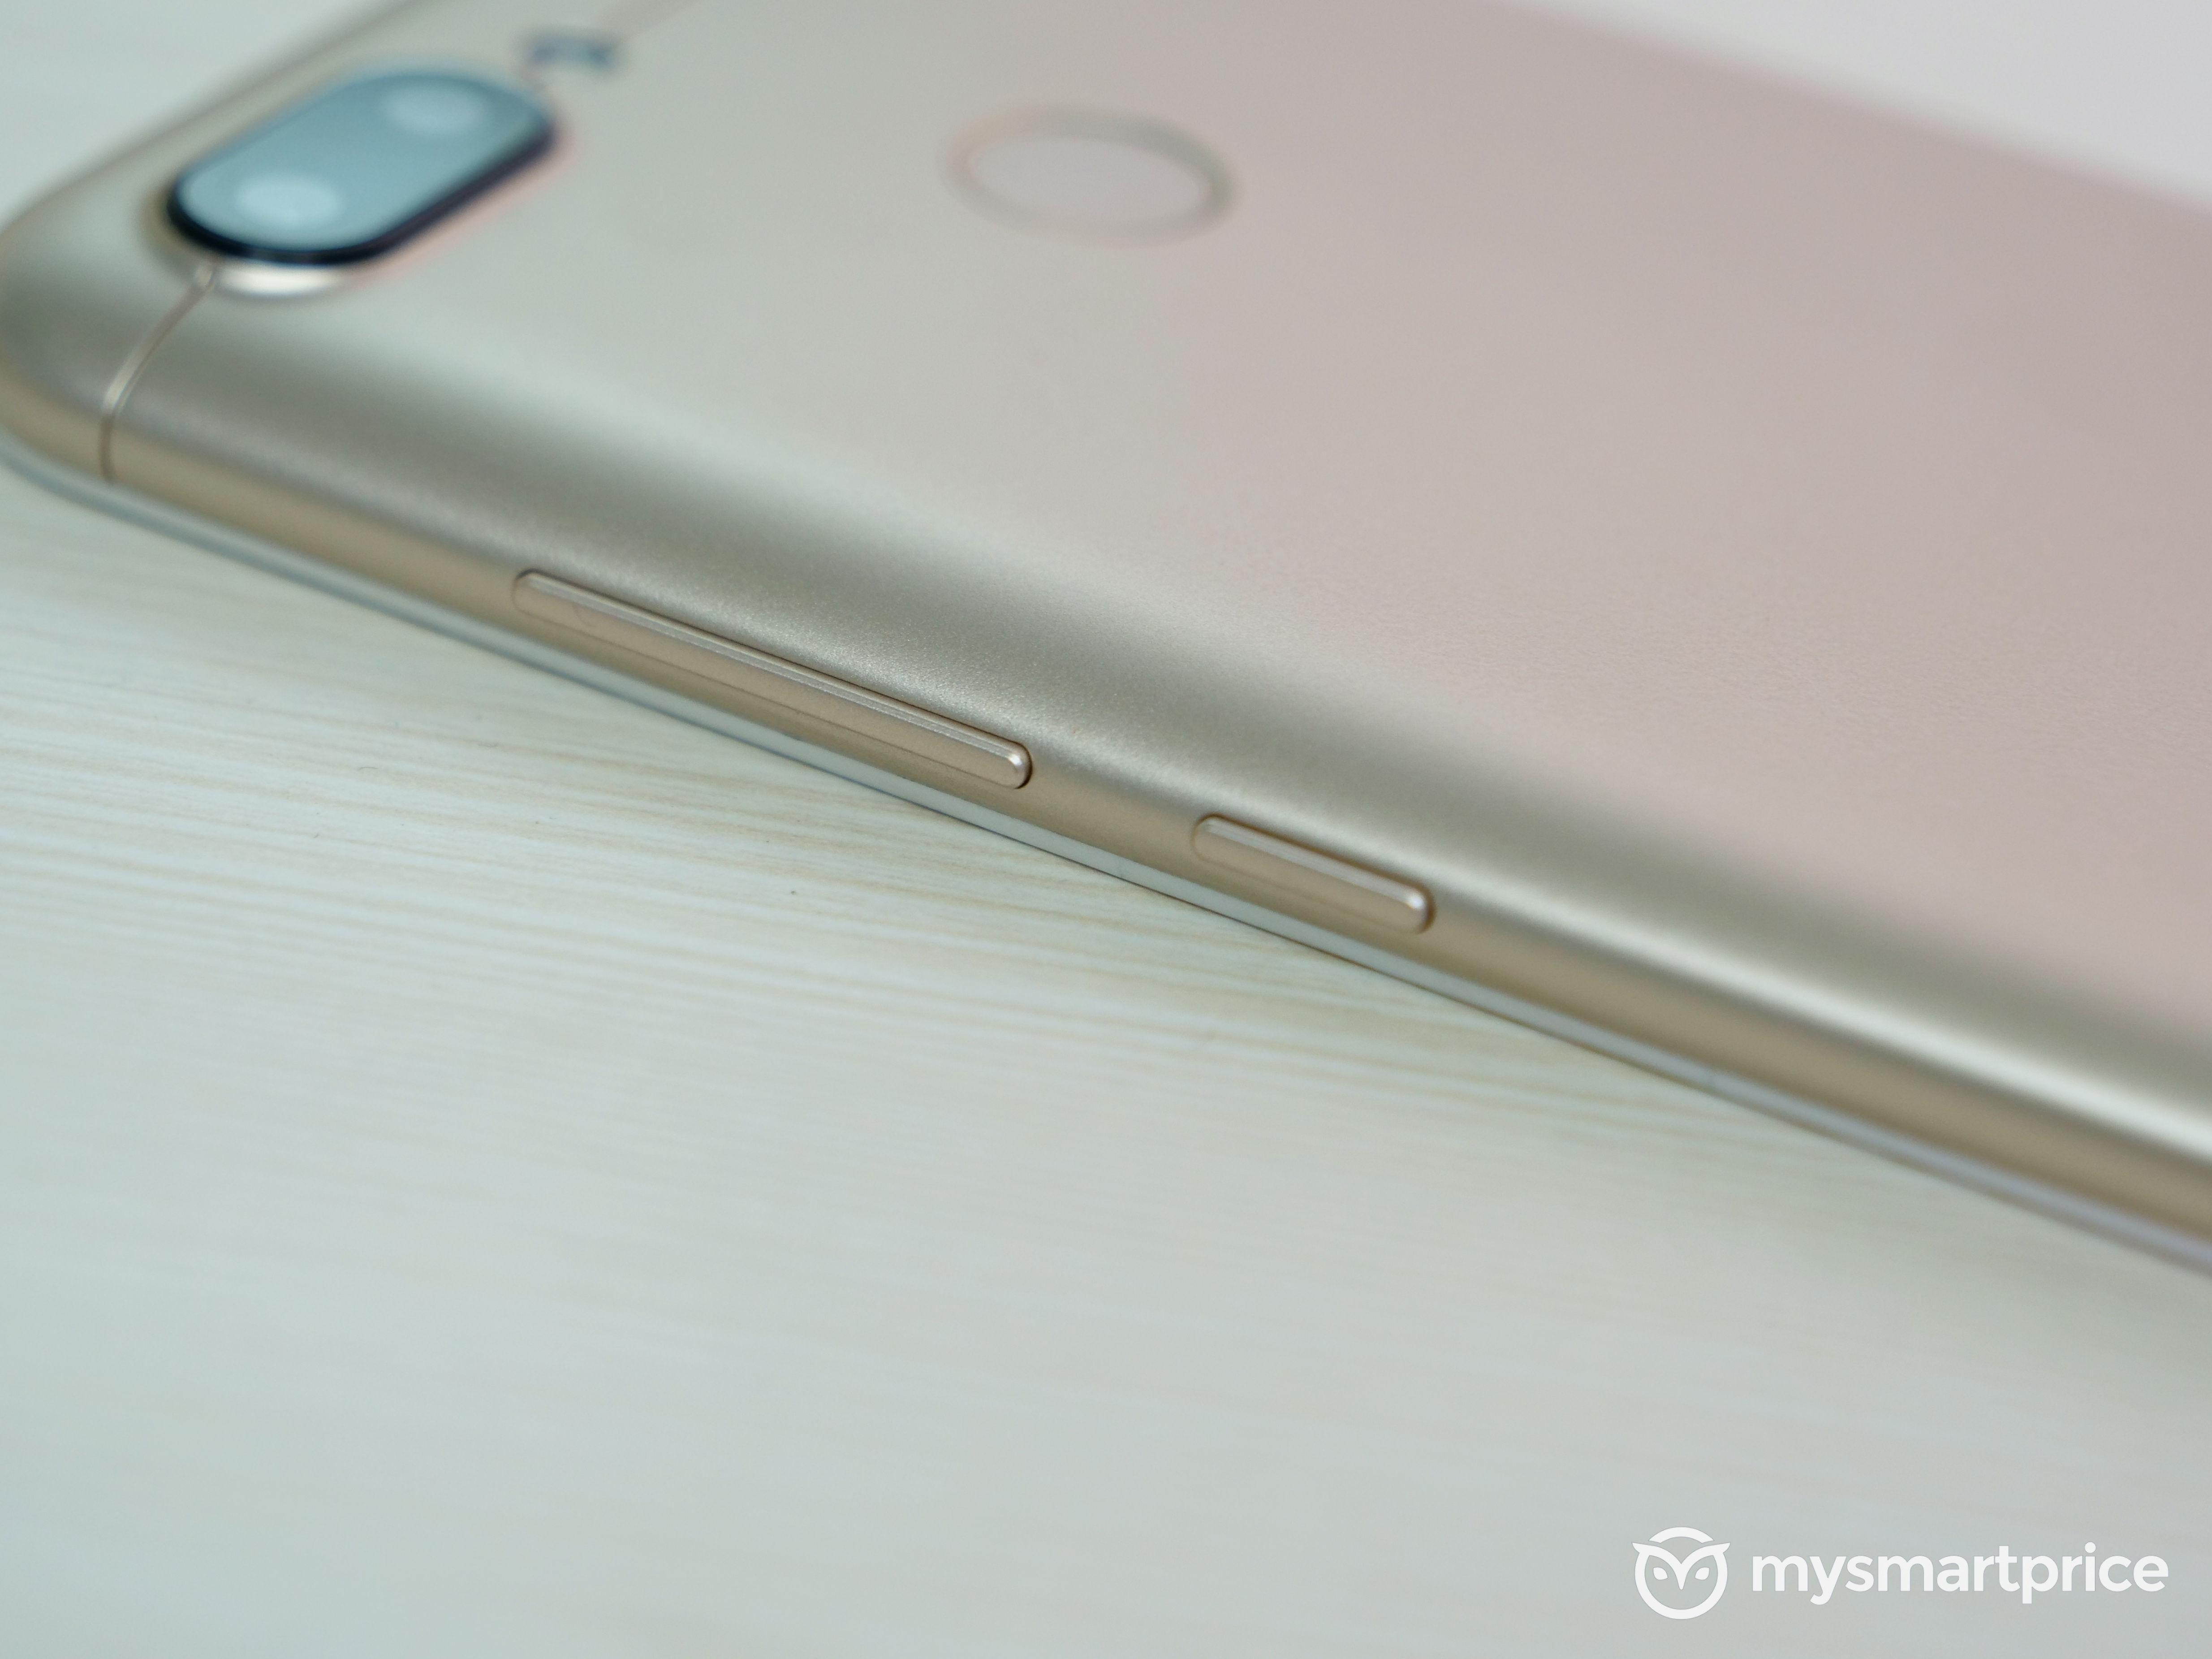 Xiaomi Redmi 6 Power Volume Buttons